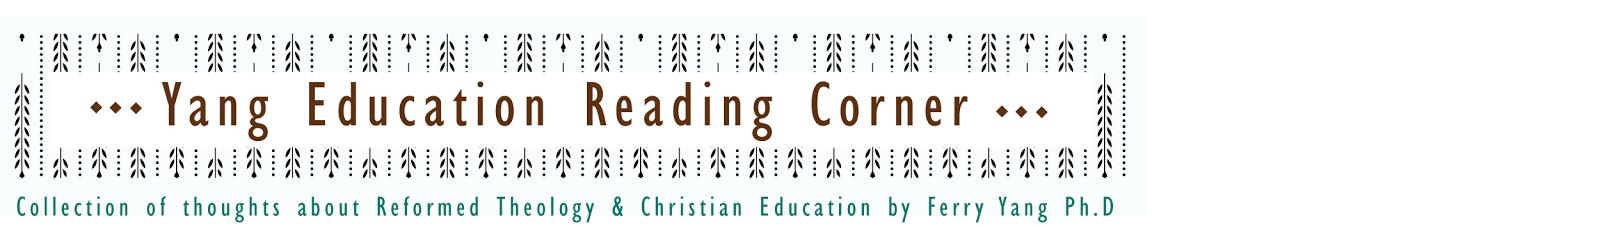 Yang Education Reading Corner